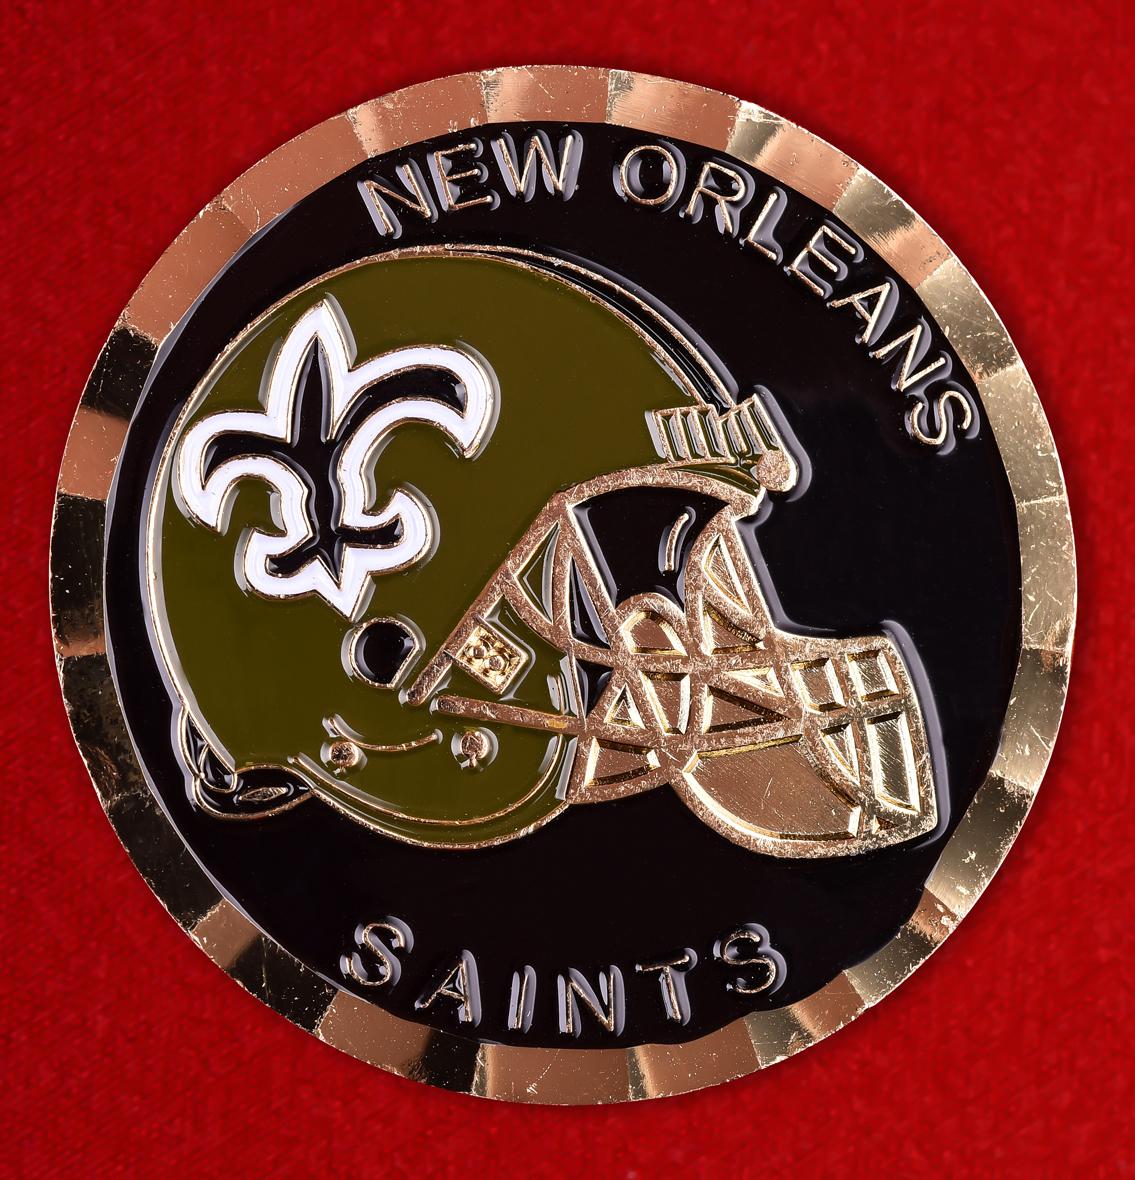 Знак клуба американского футбола New Orlean Saints